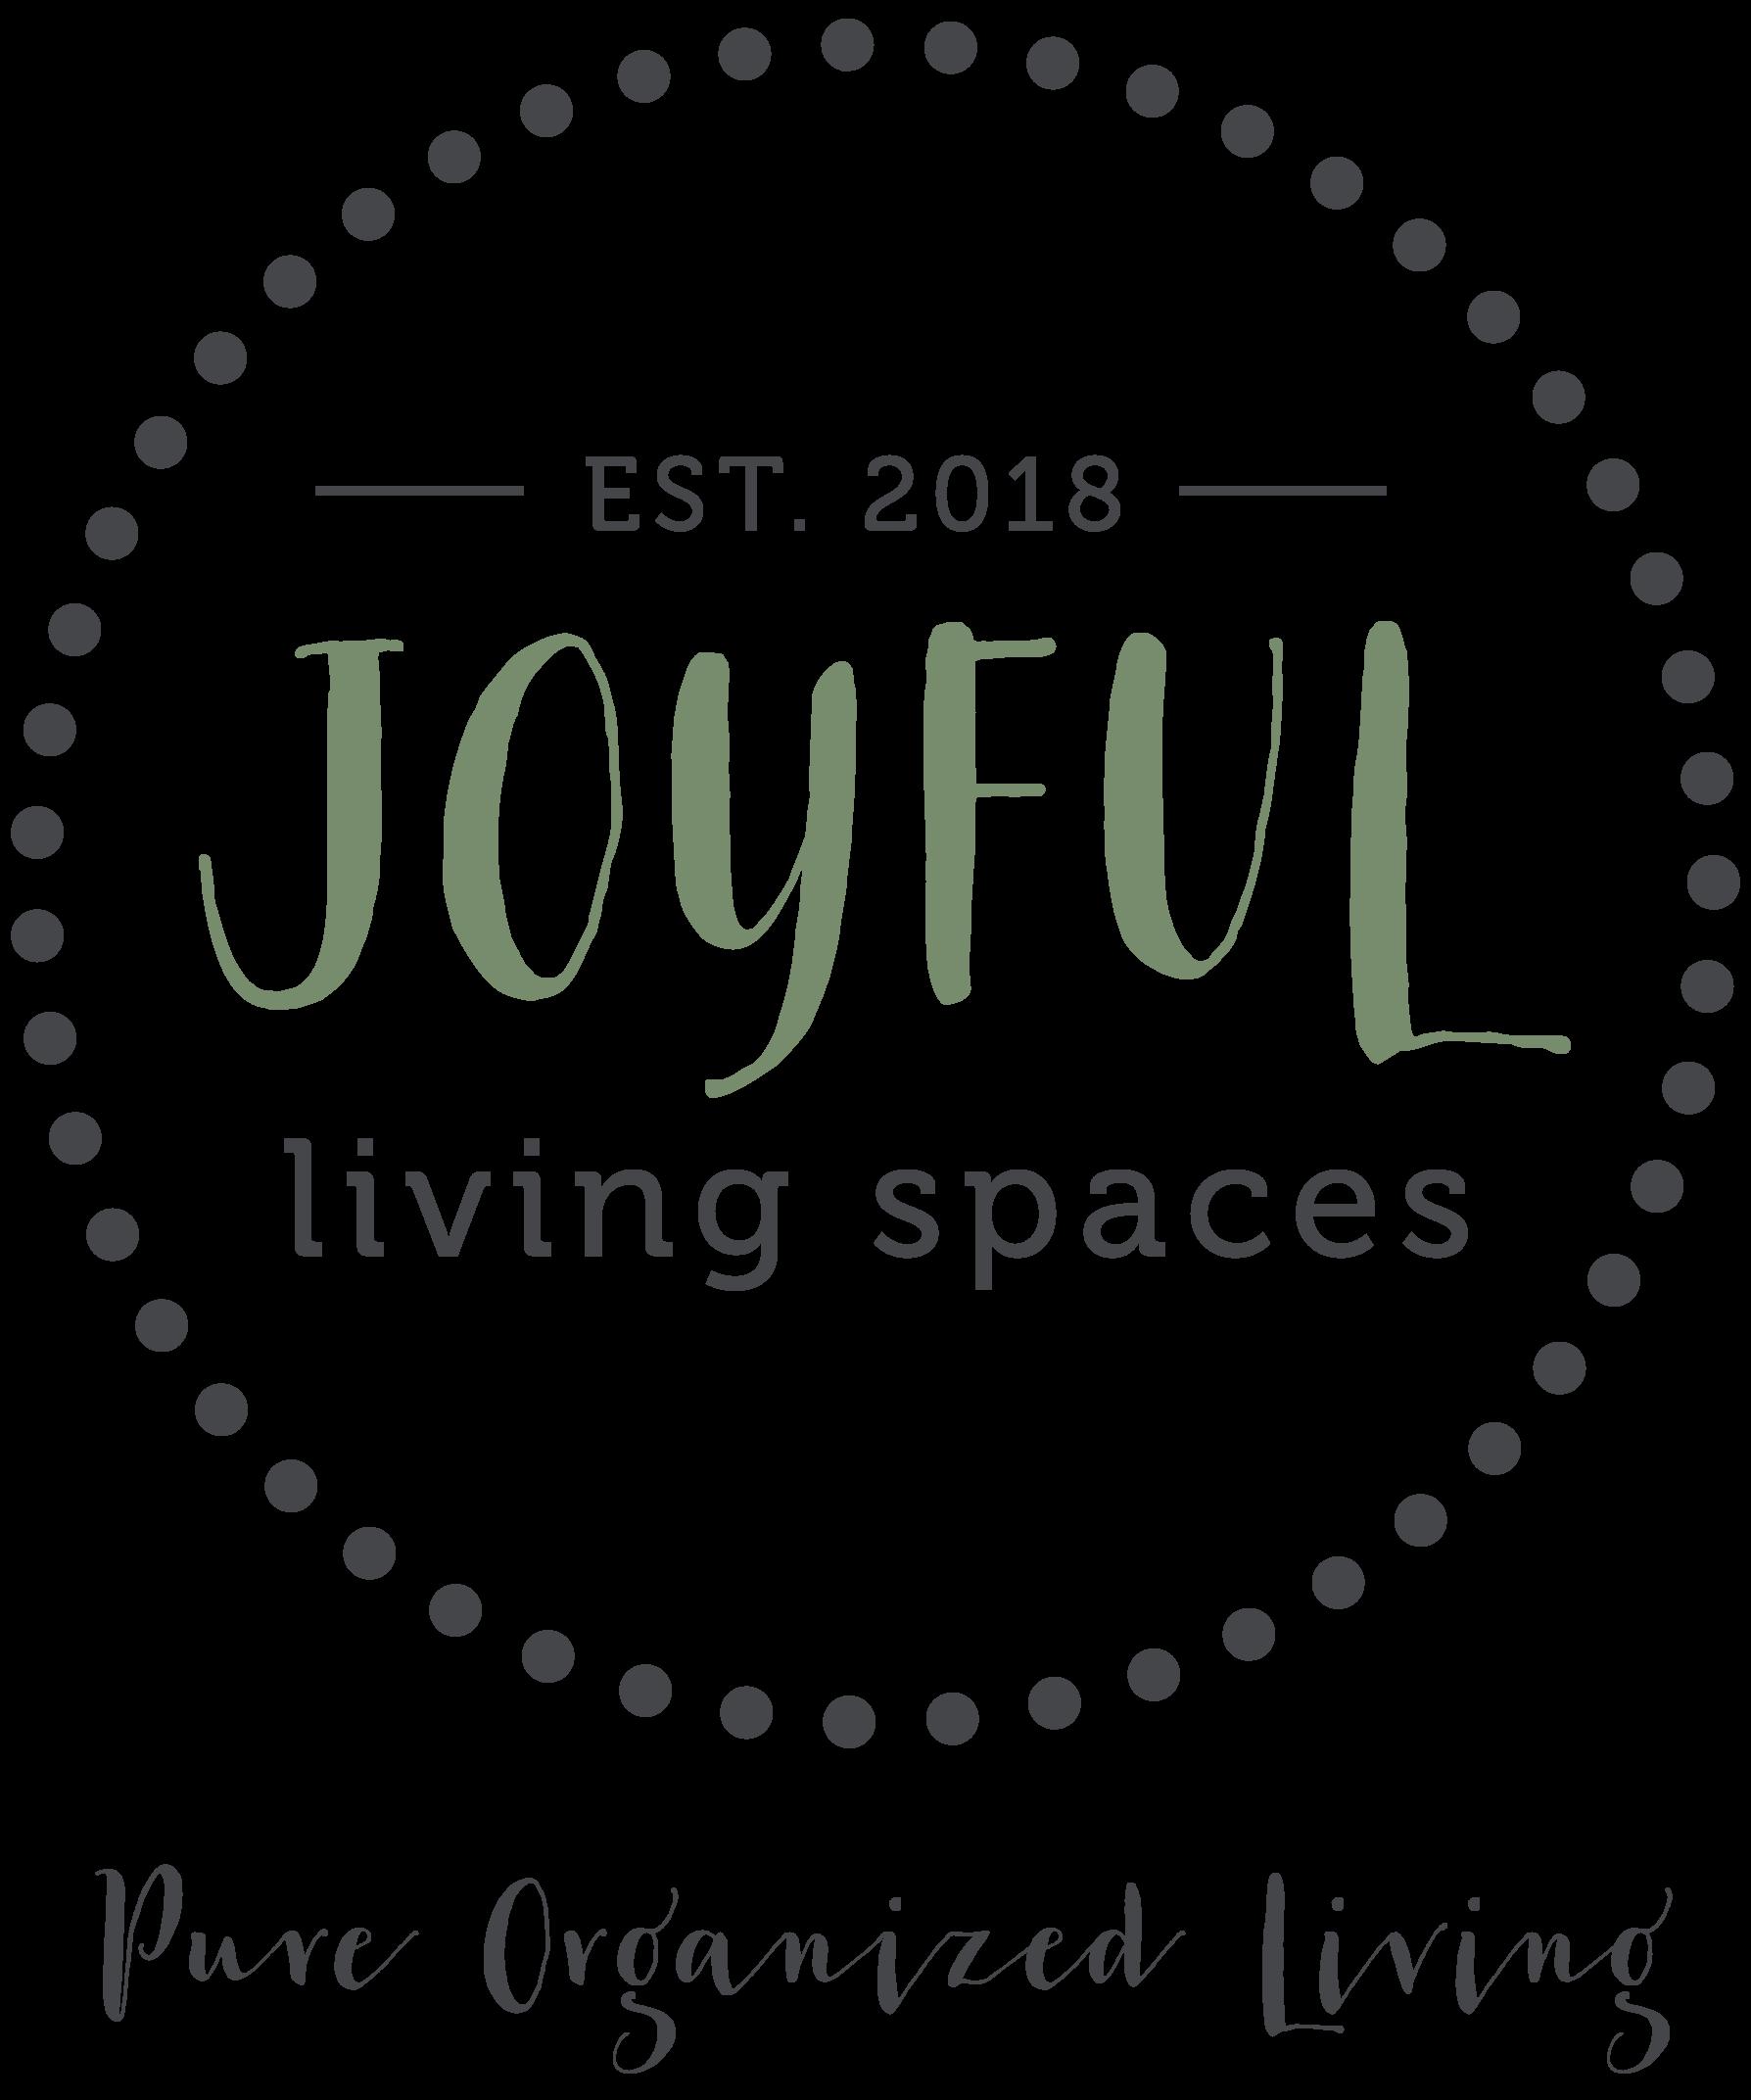 Joyful Living Spaces